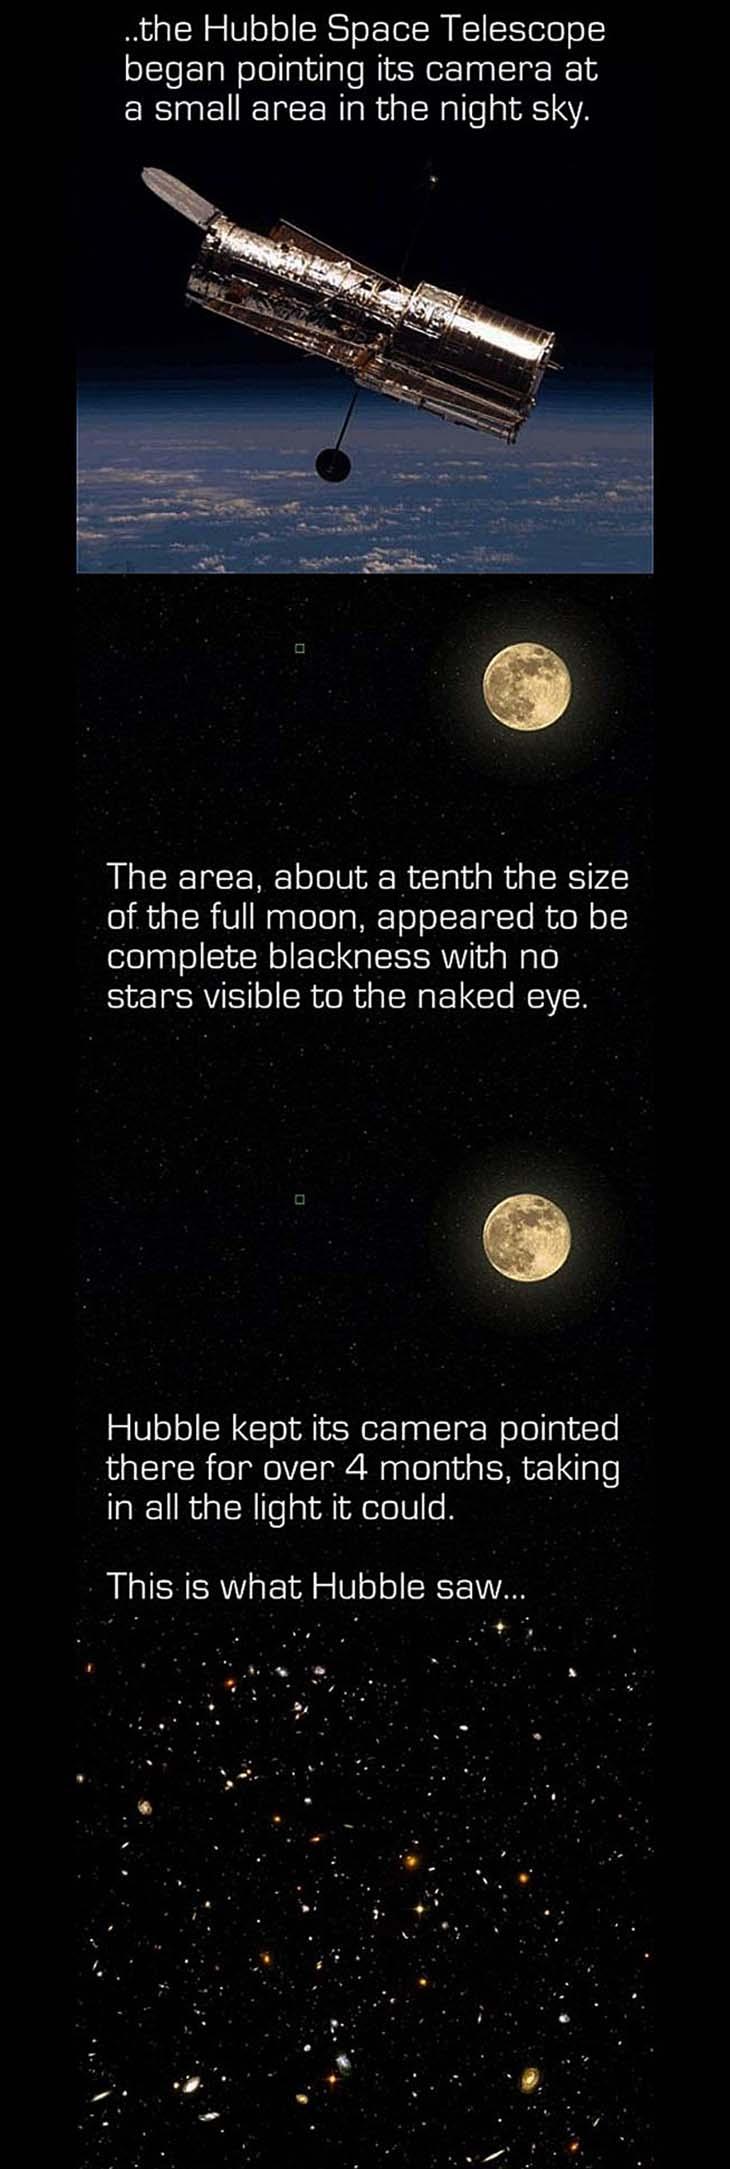 cool-Space-Telescope-camera-sky-earth-moon